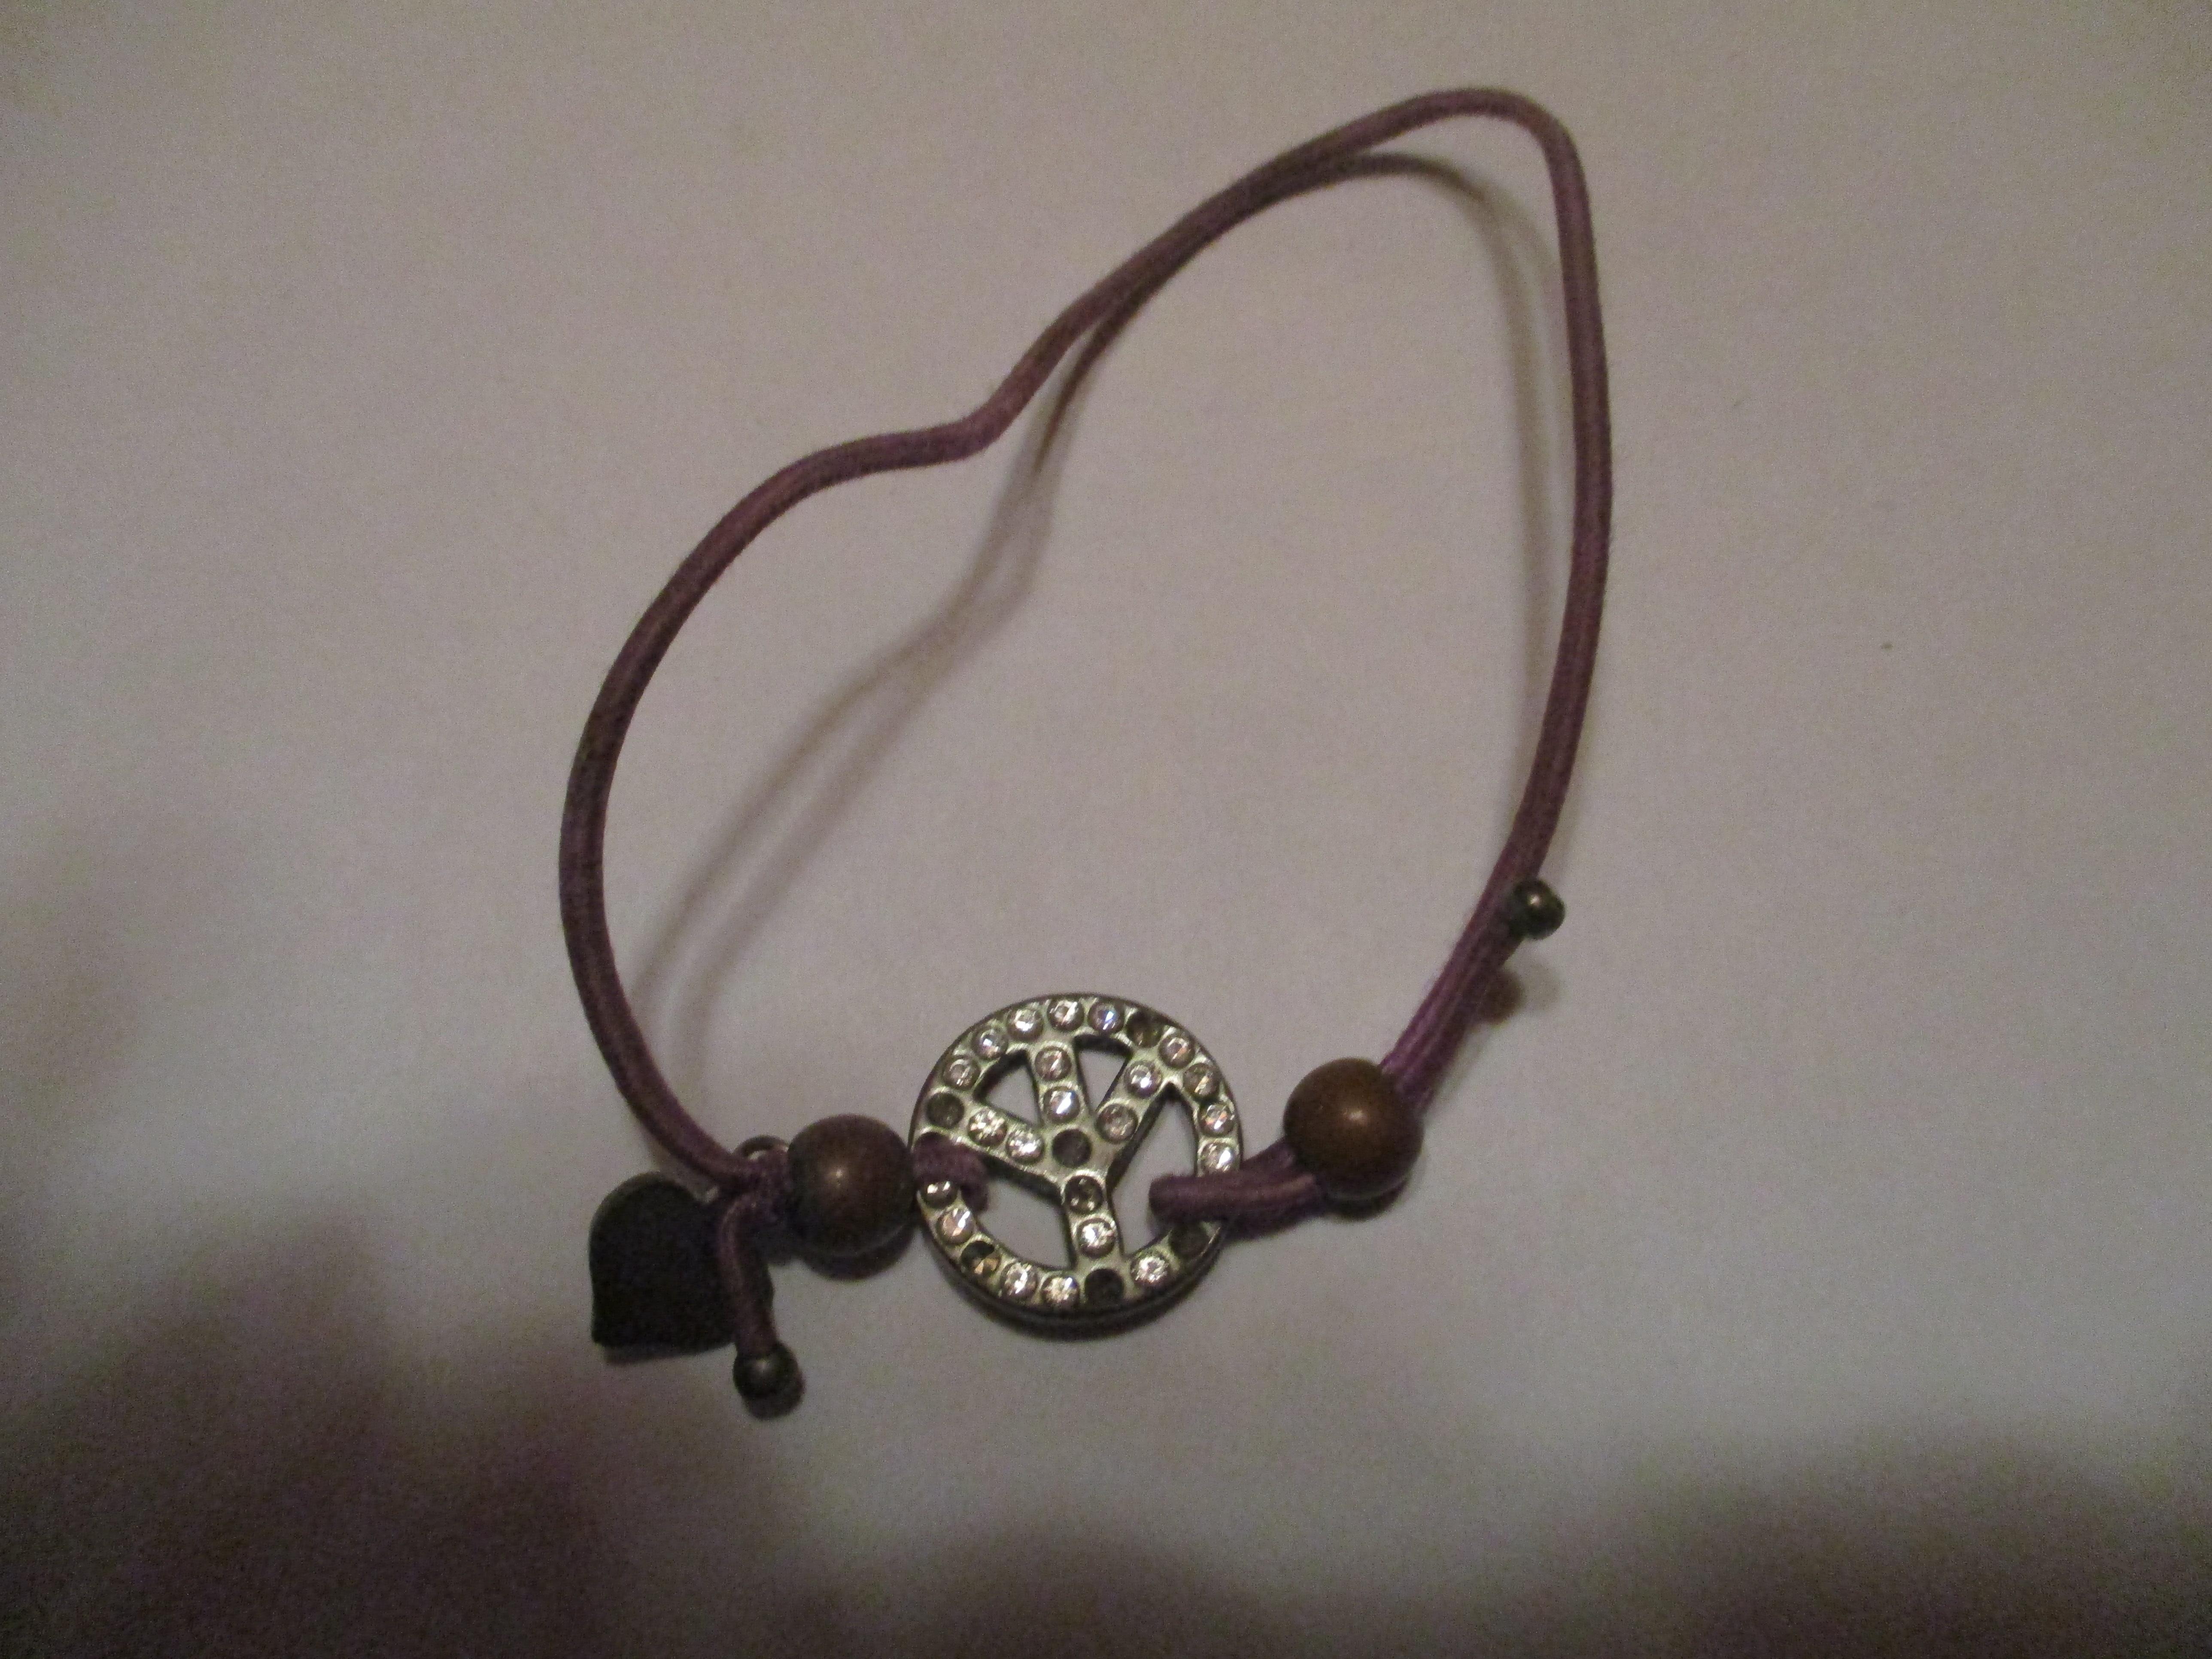 troc de troc bracelet symbole image 1